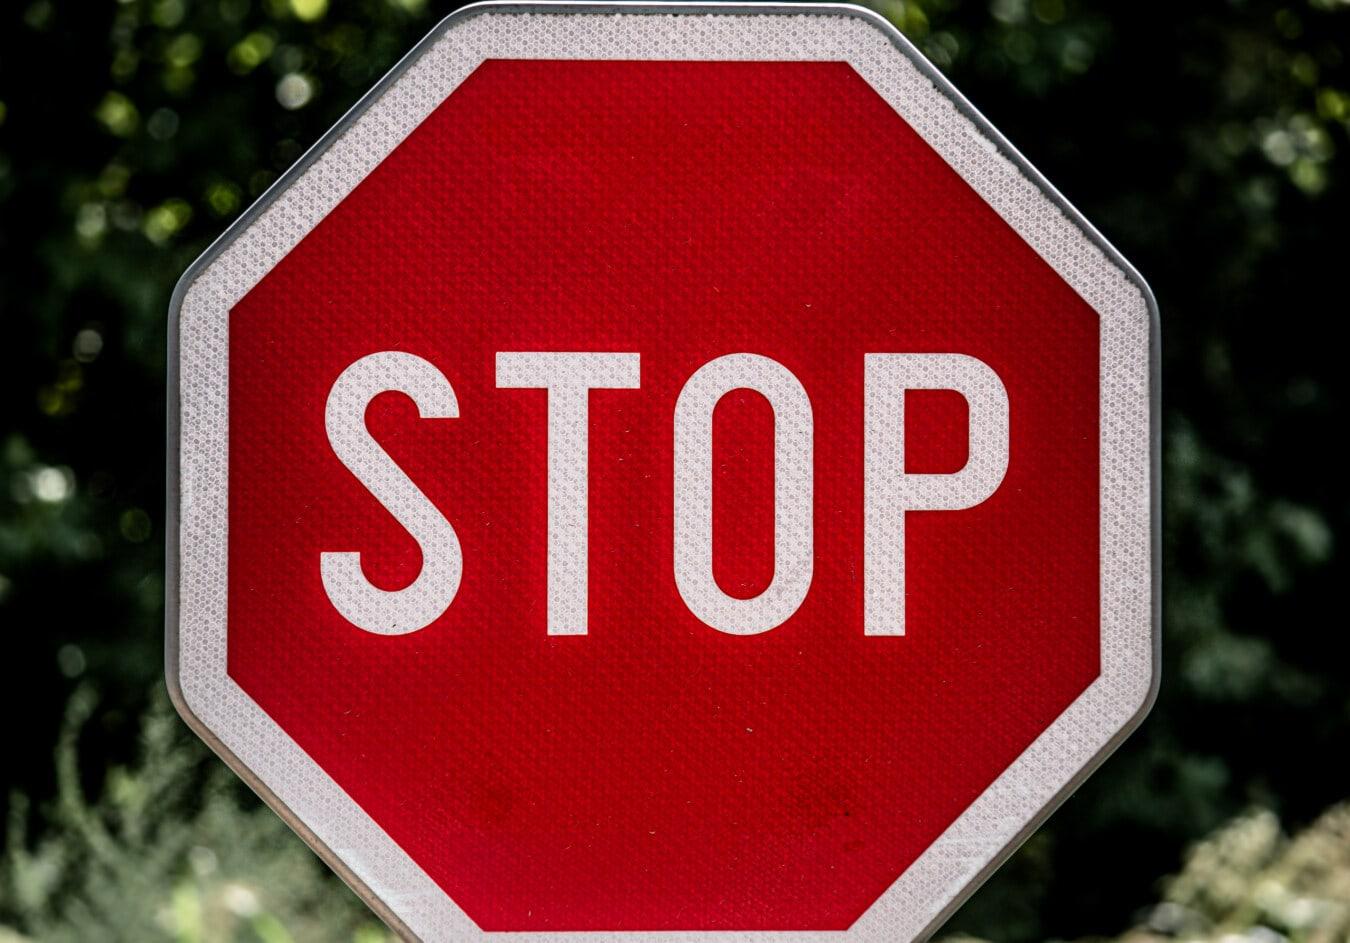 stop, sign, traffic control, traffic, alpha, symbol, text, alarm, road, warning